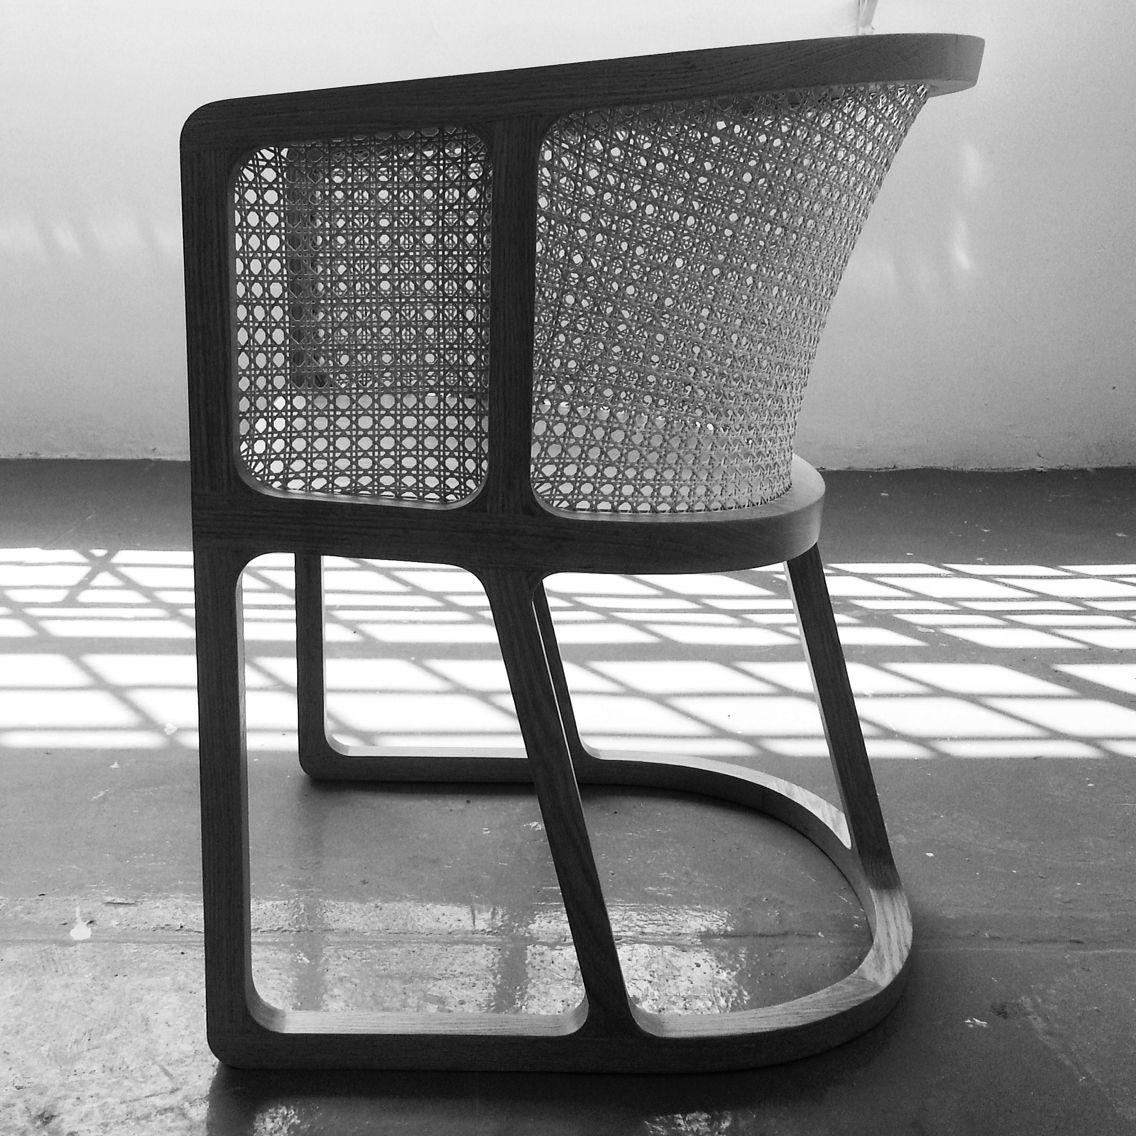 Silla Bejuco Por Myt Dise 241 O Linea Bejuco Furniture By